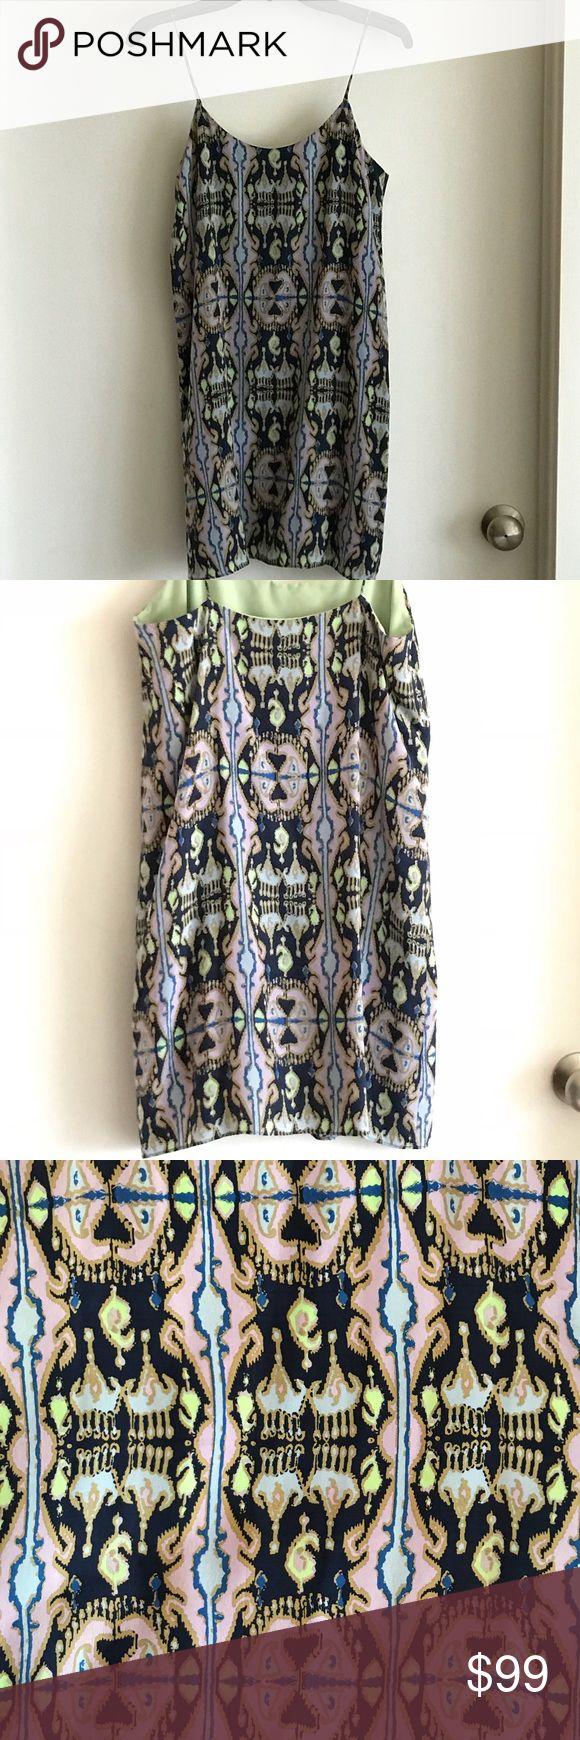 Tibi slip dress Ikat printed 100% silk slip dress. Tibi Dresses Mini